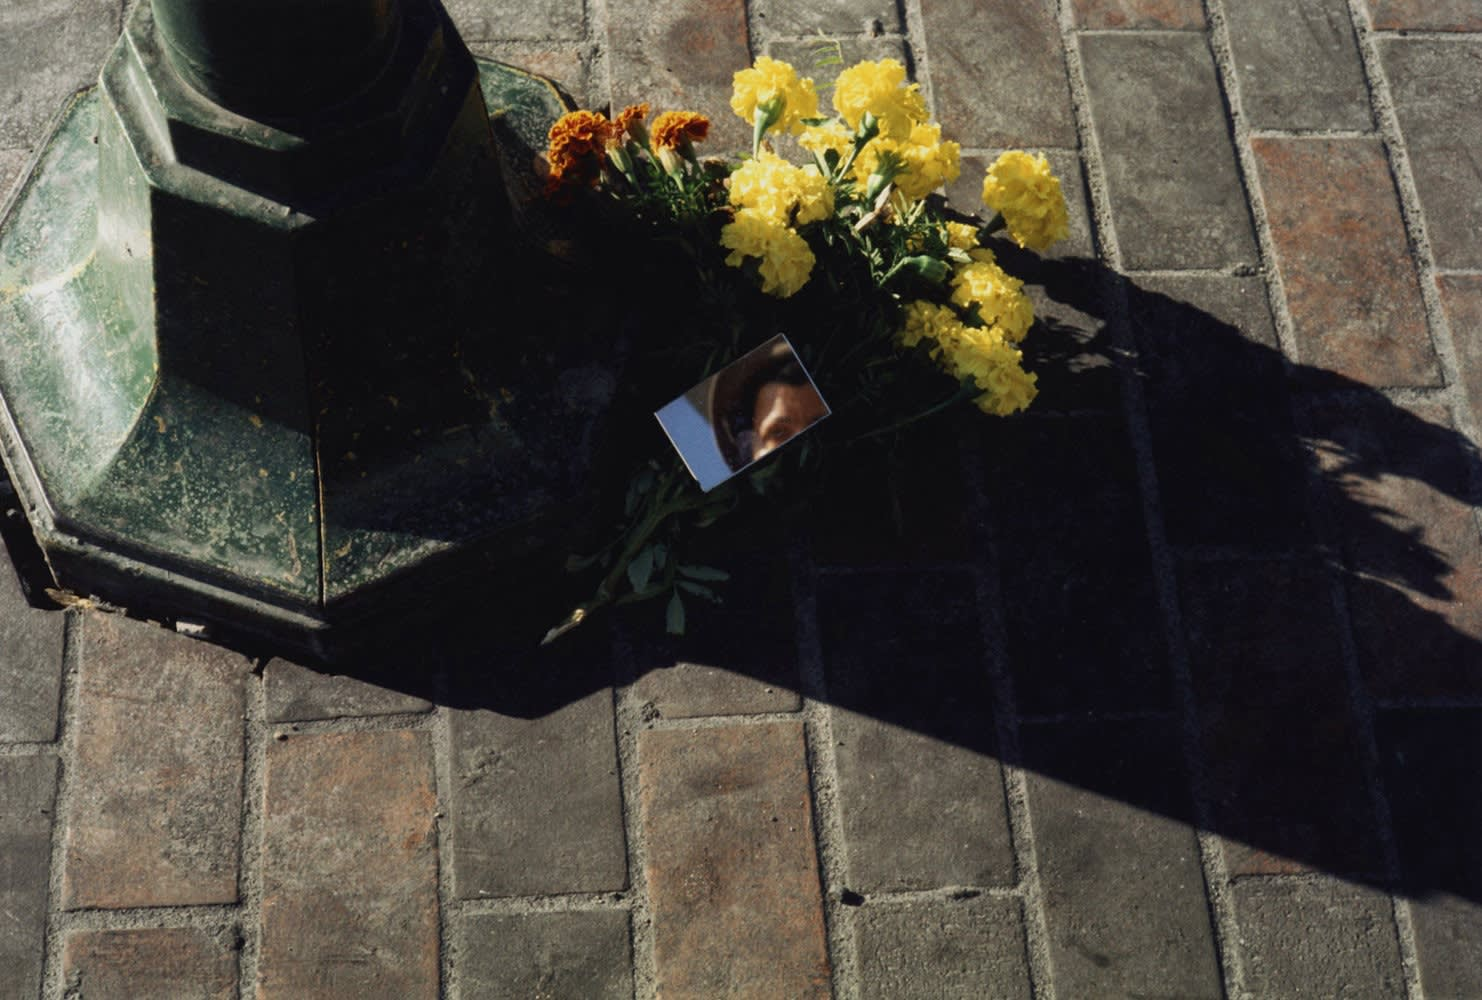 Vivian Maier, Self-portrait, Chicagoland, October 1975